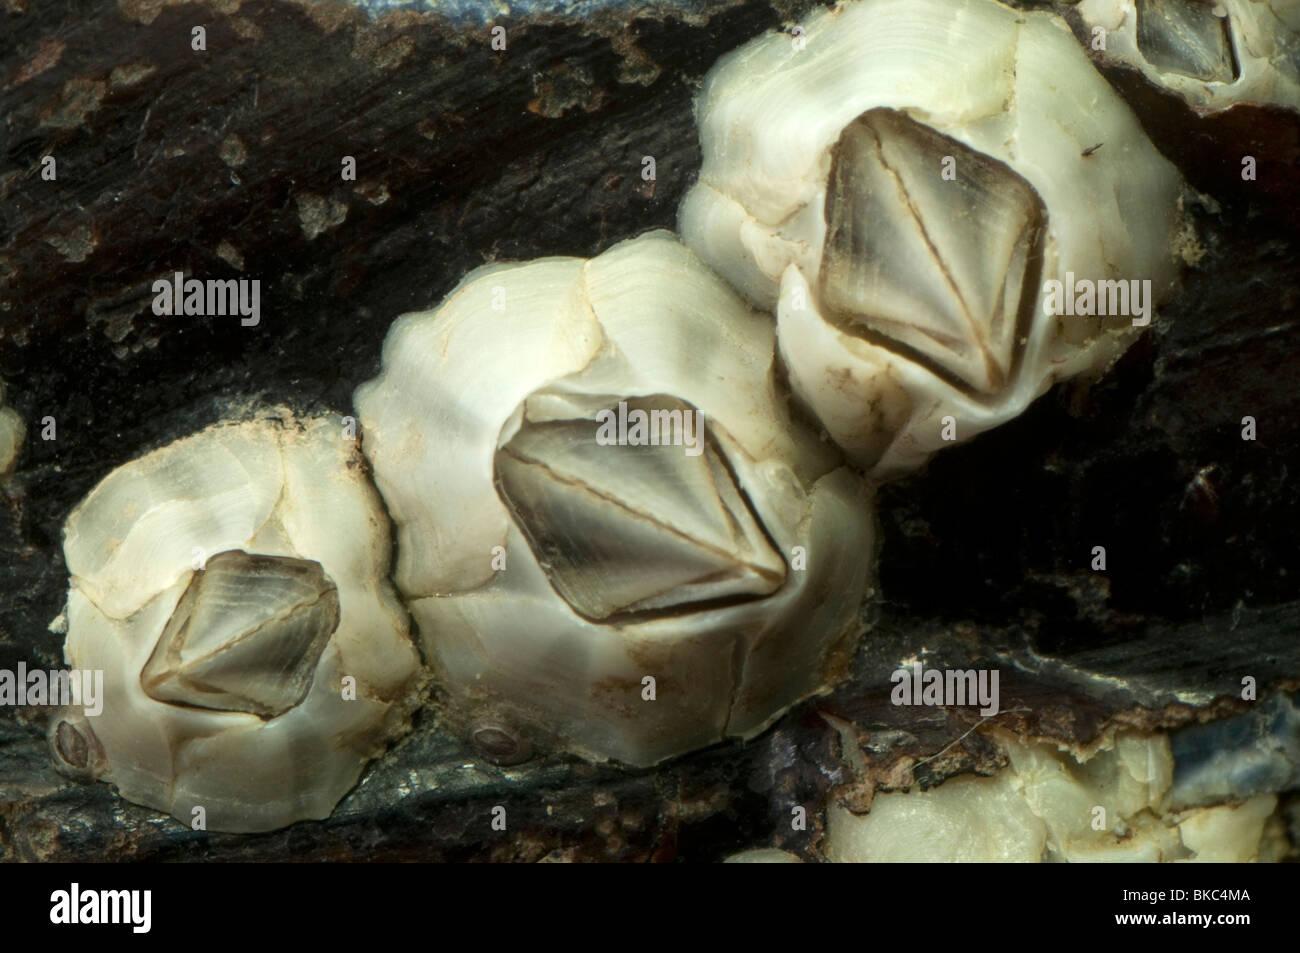 Australian barnacle (Elminius modestus) on a mussel shell. Stock Photo